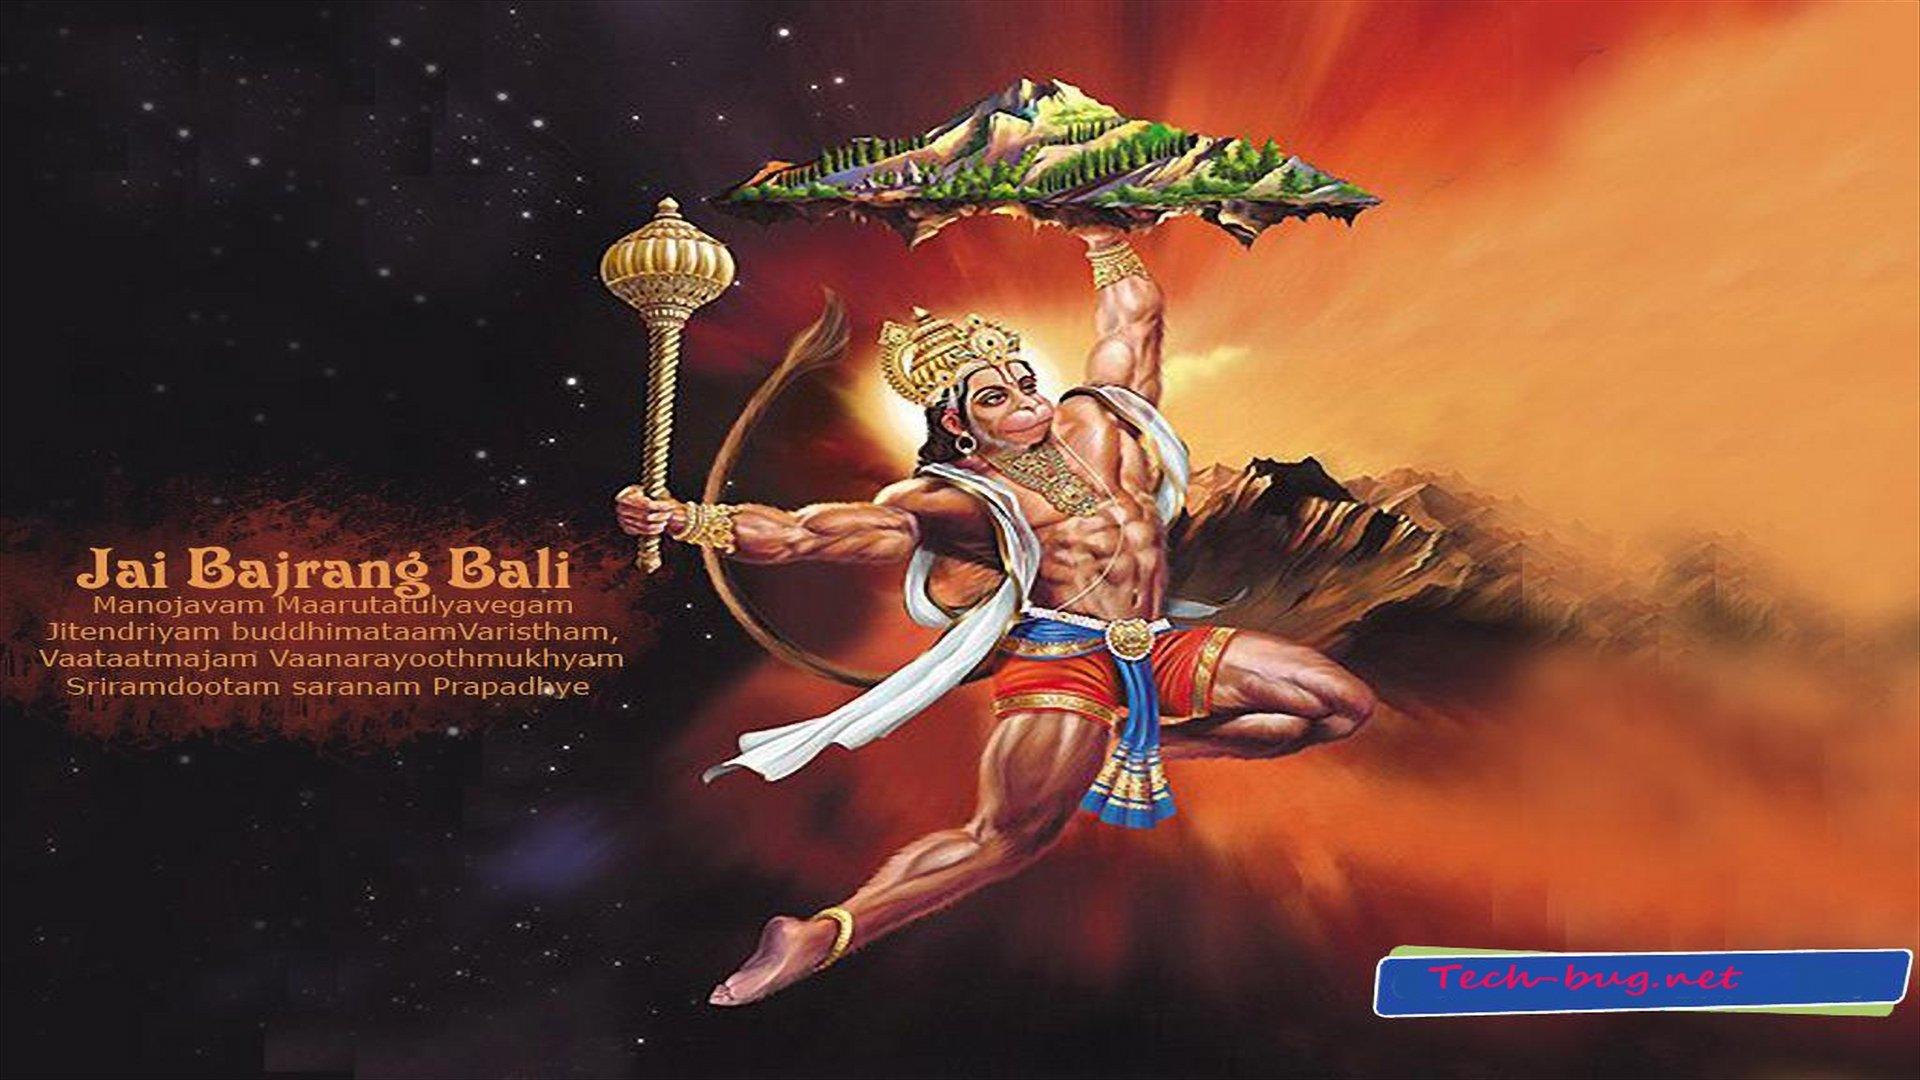 Hd wallpaper ganesh - Hd Hindu God Wallpaper Wallpapersafari